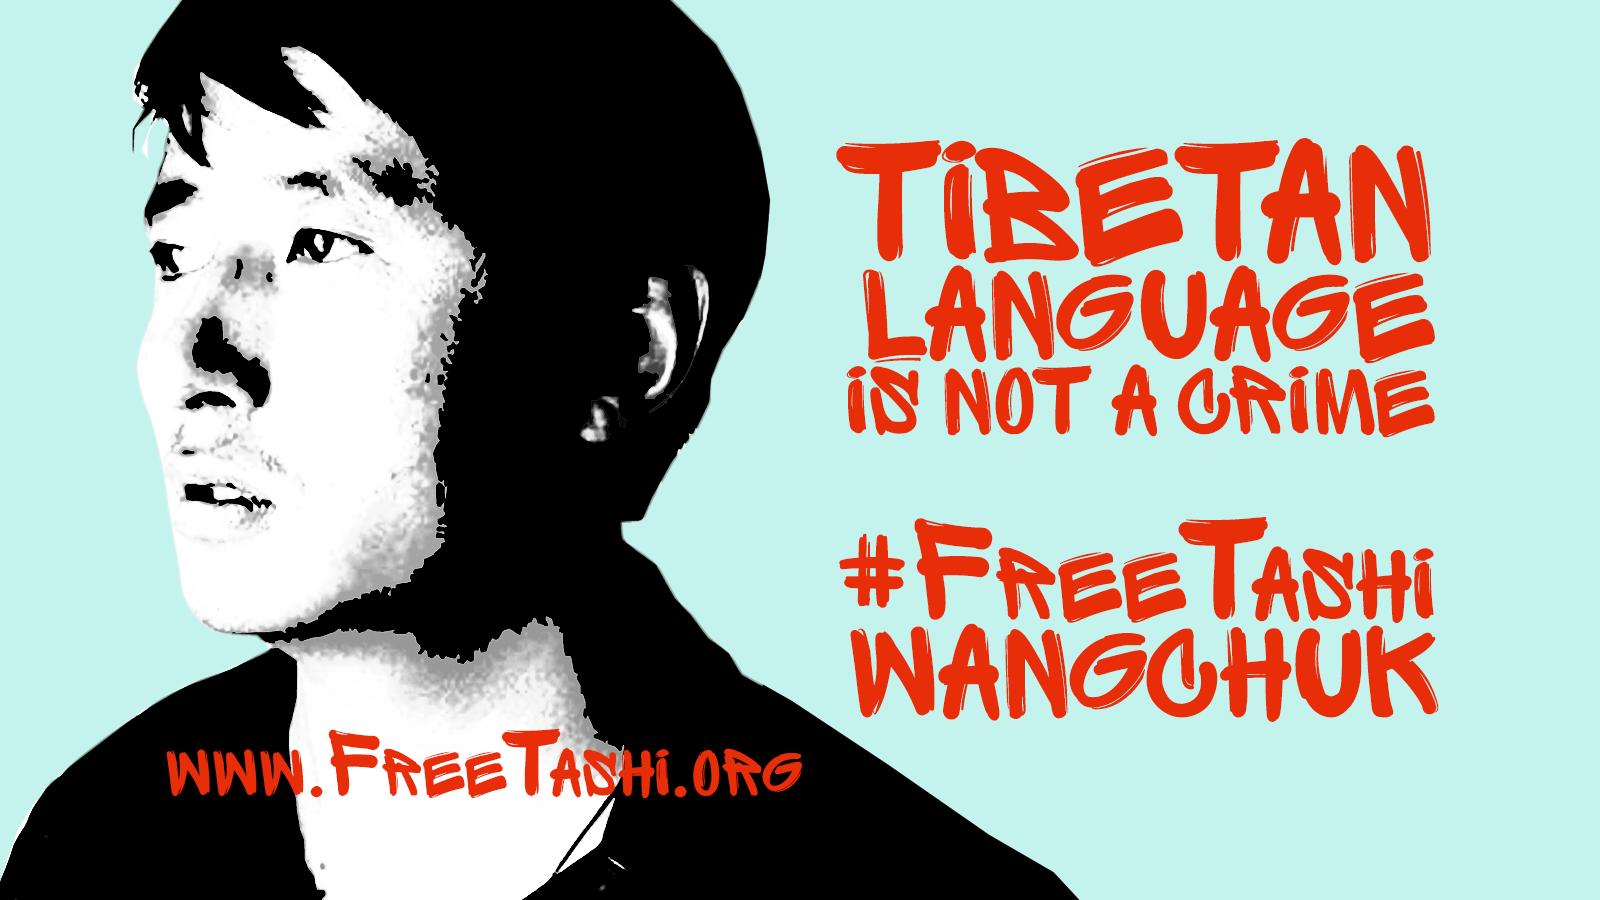 Free Tashi Wangchuk: Take Action Now